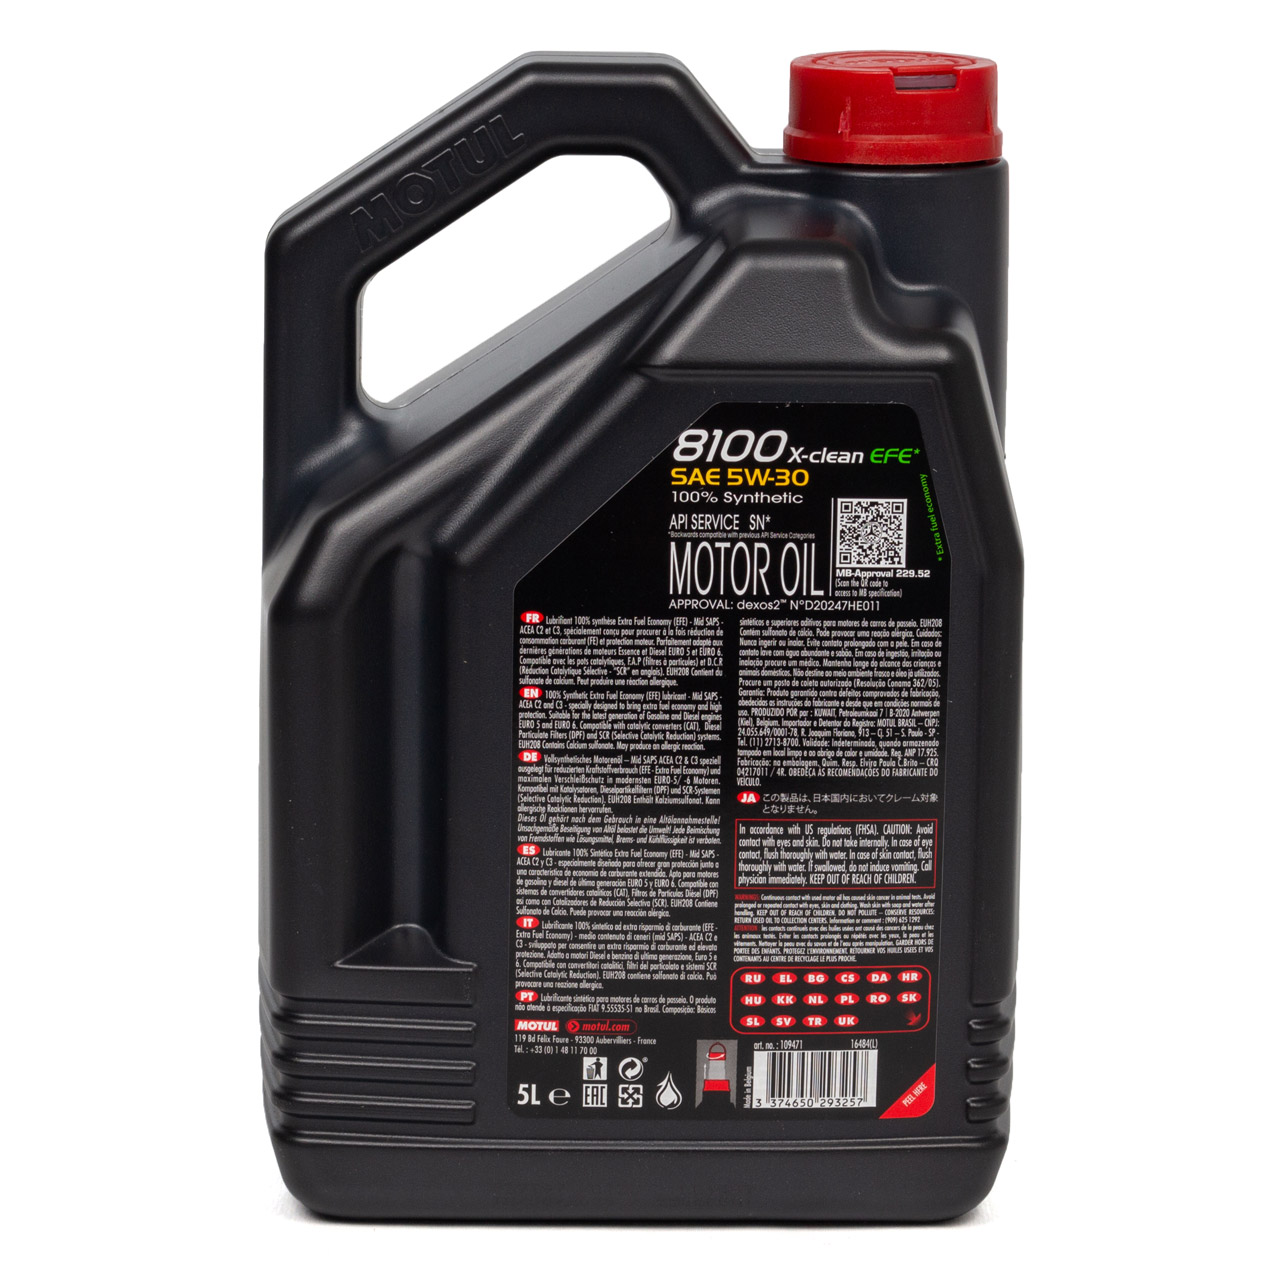 MOTUL 8100 X-Clean EFE Motoröl Öl 5W30 dexos2 VW 505.00/505.01 - 5L 5 Liter